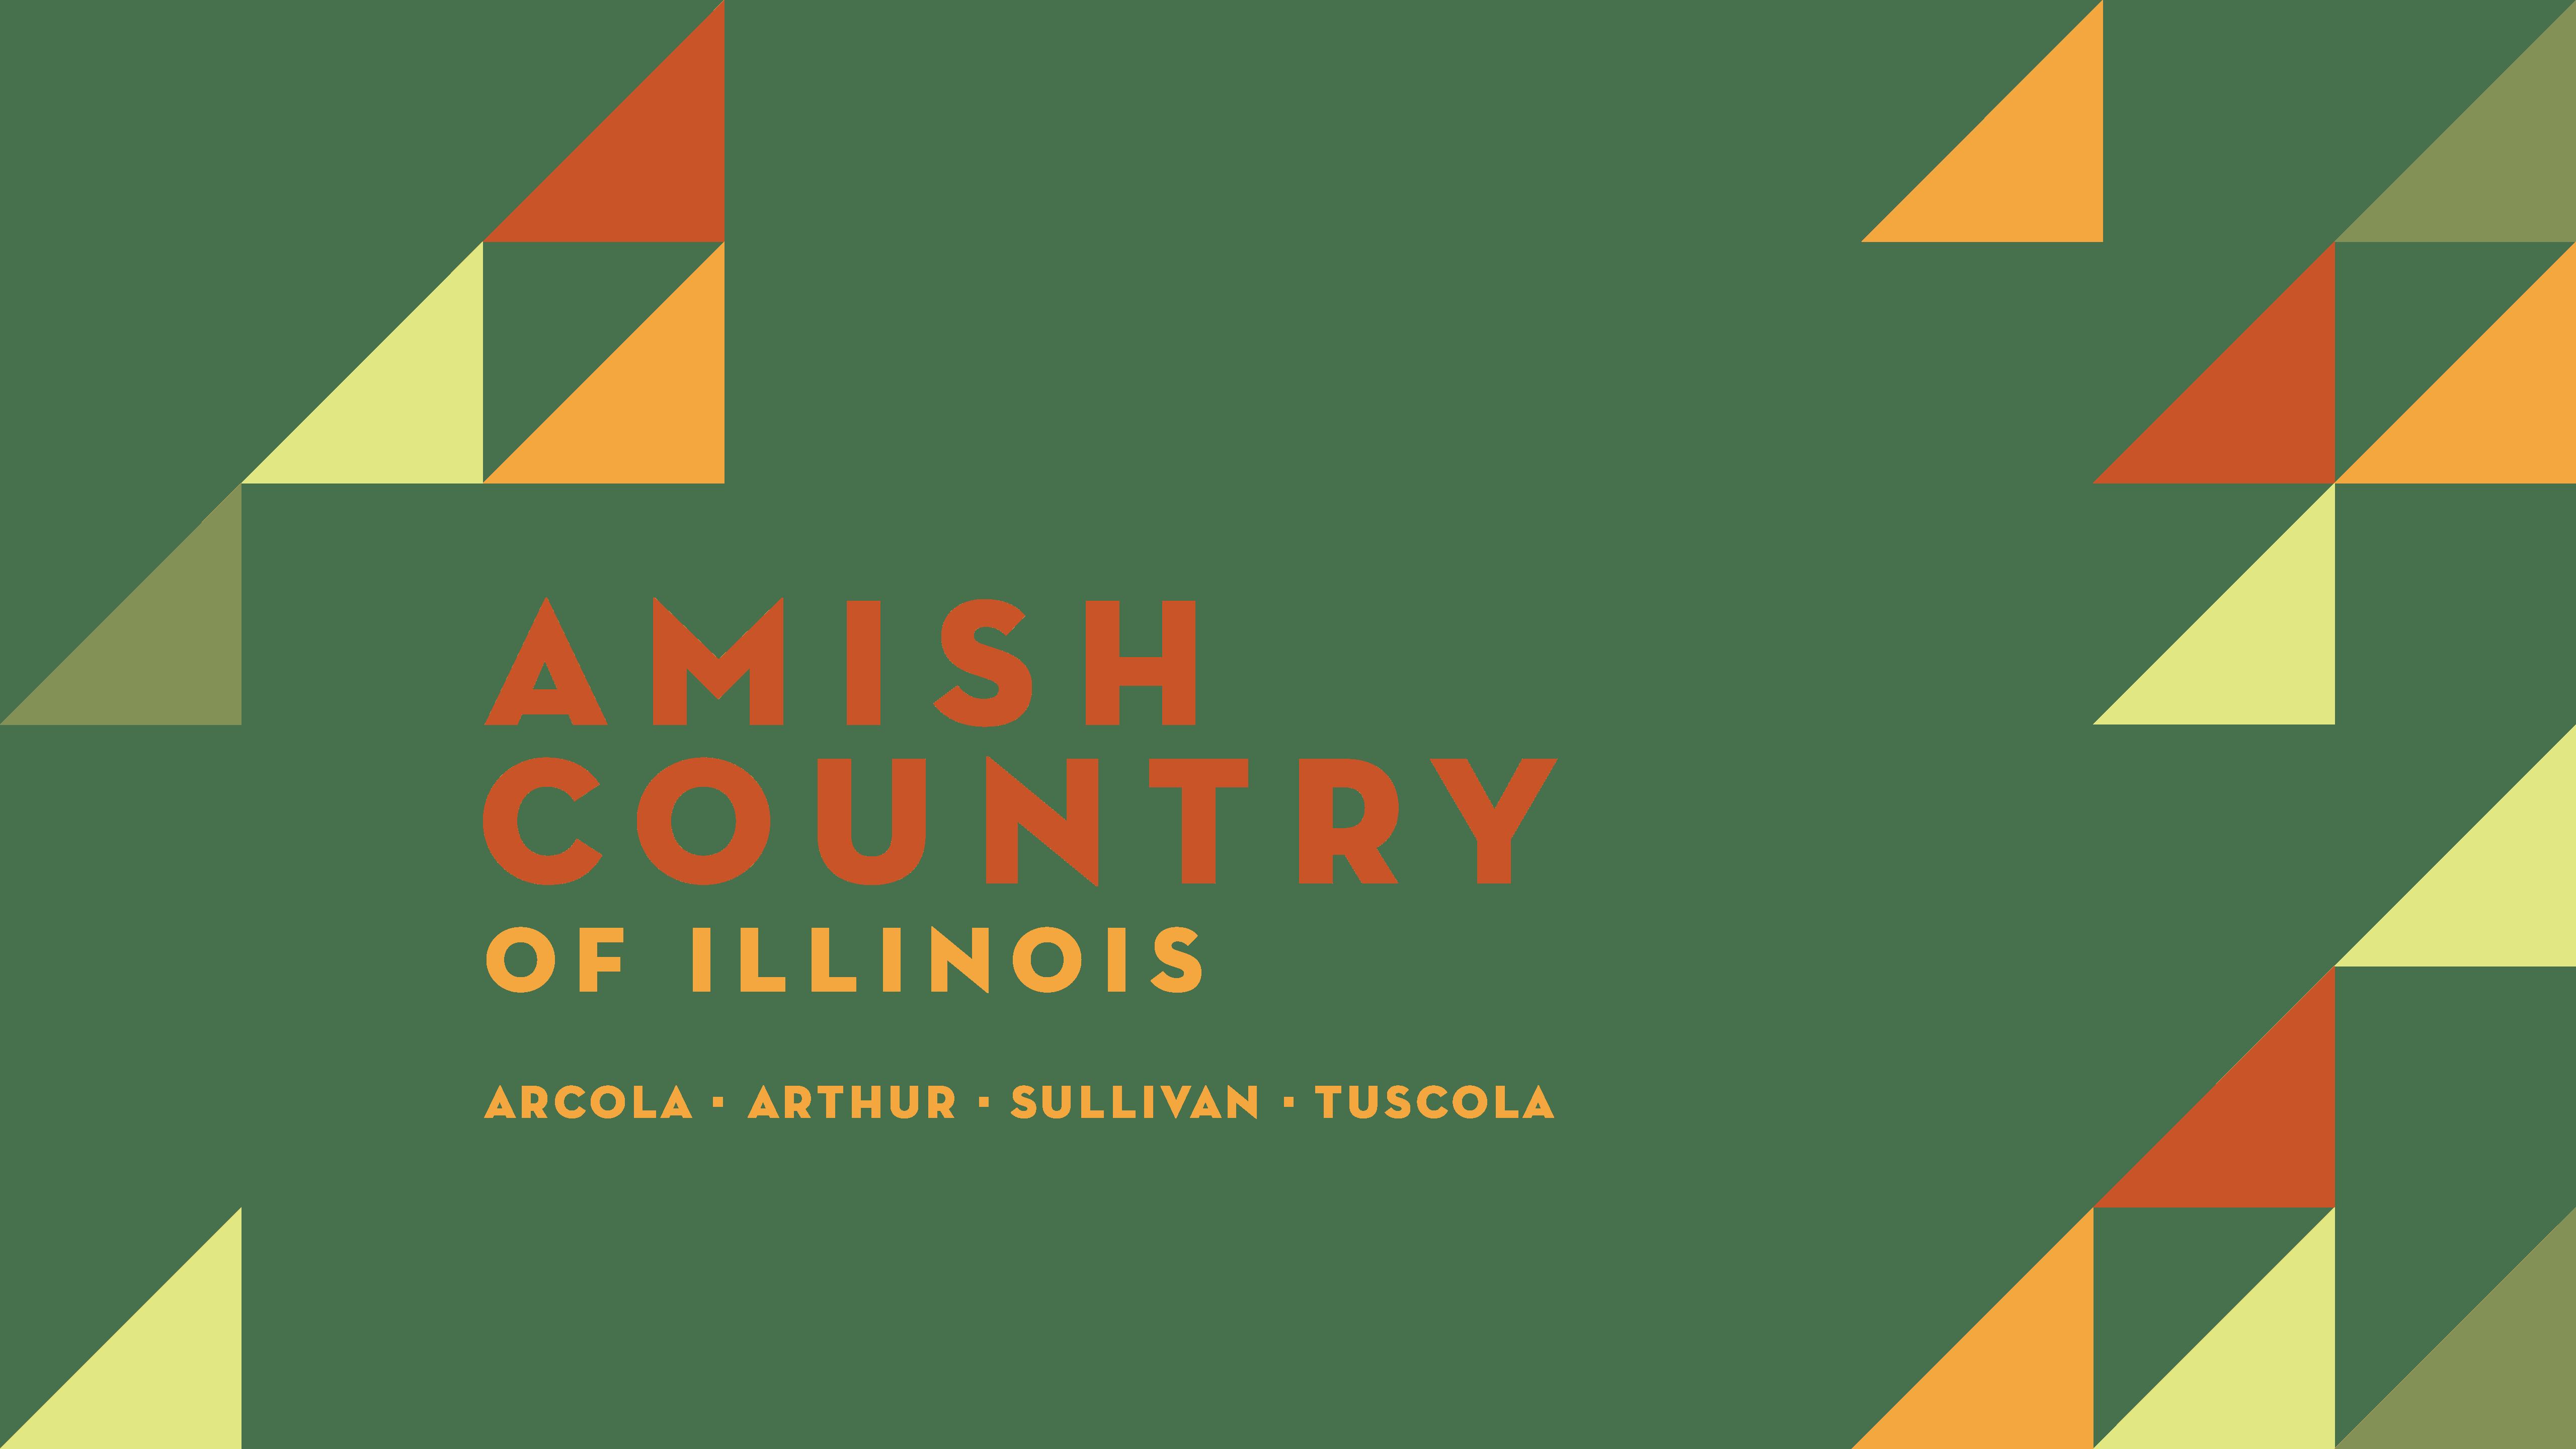 Amish Country of Illinois Branding - Logo